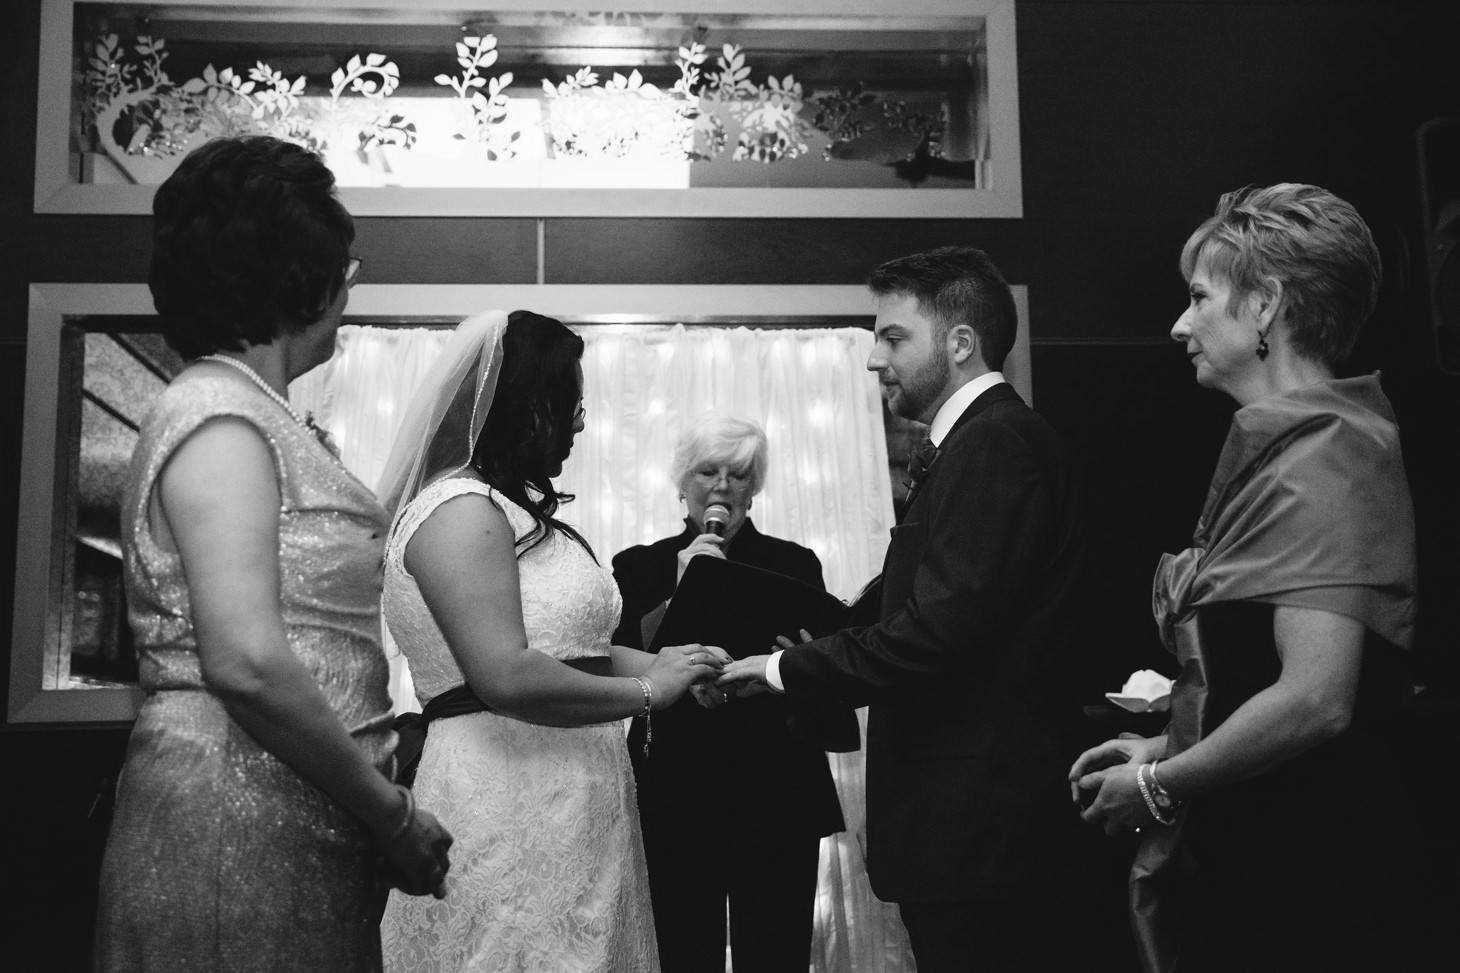 036-nyc-wedding-portrait-photographer-times-square-muse-hotel-winter-wedding-smitten-chickens.jpg